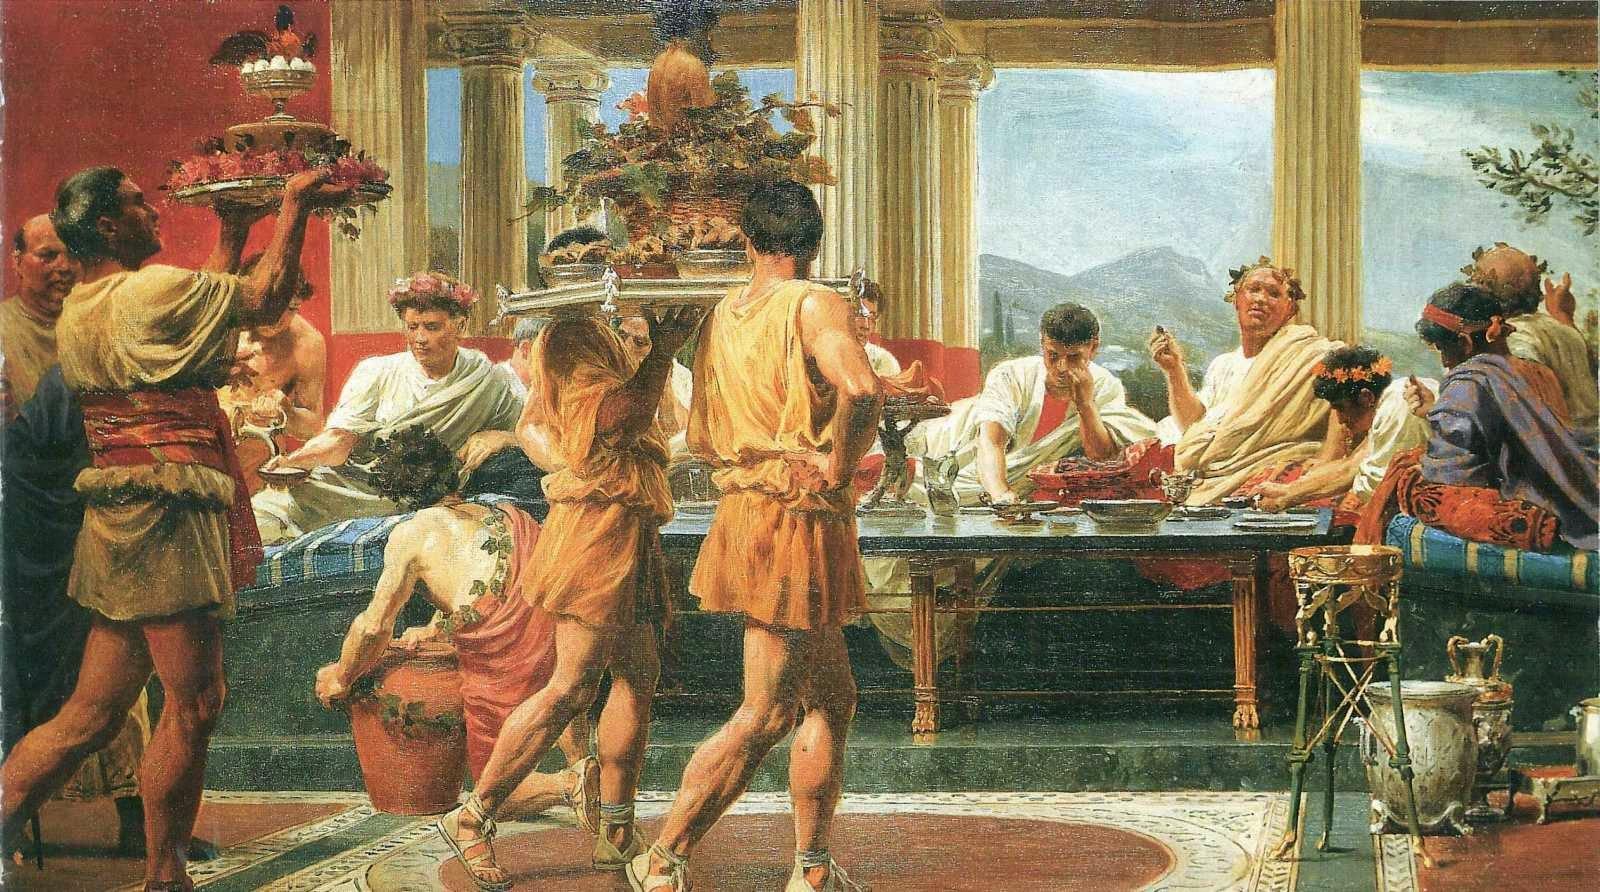 ROMA symposium-the-banquet-anton-von-werner-copia